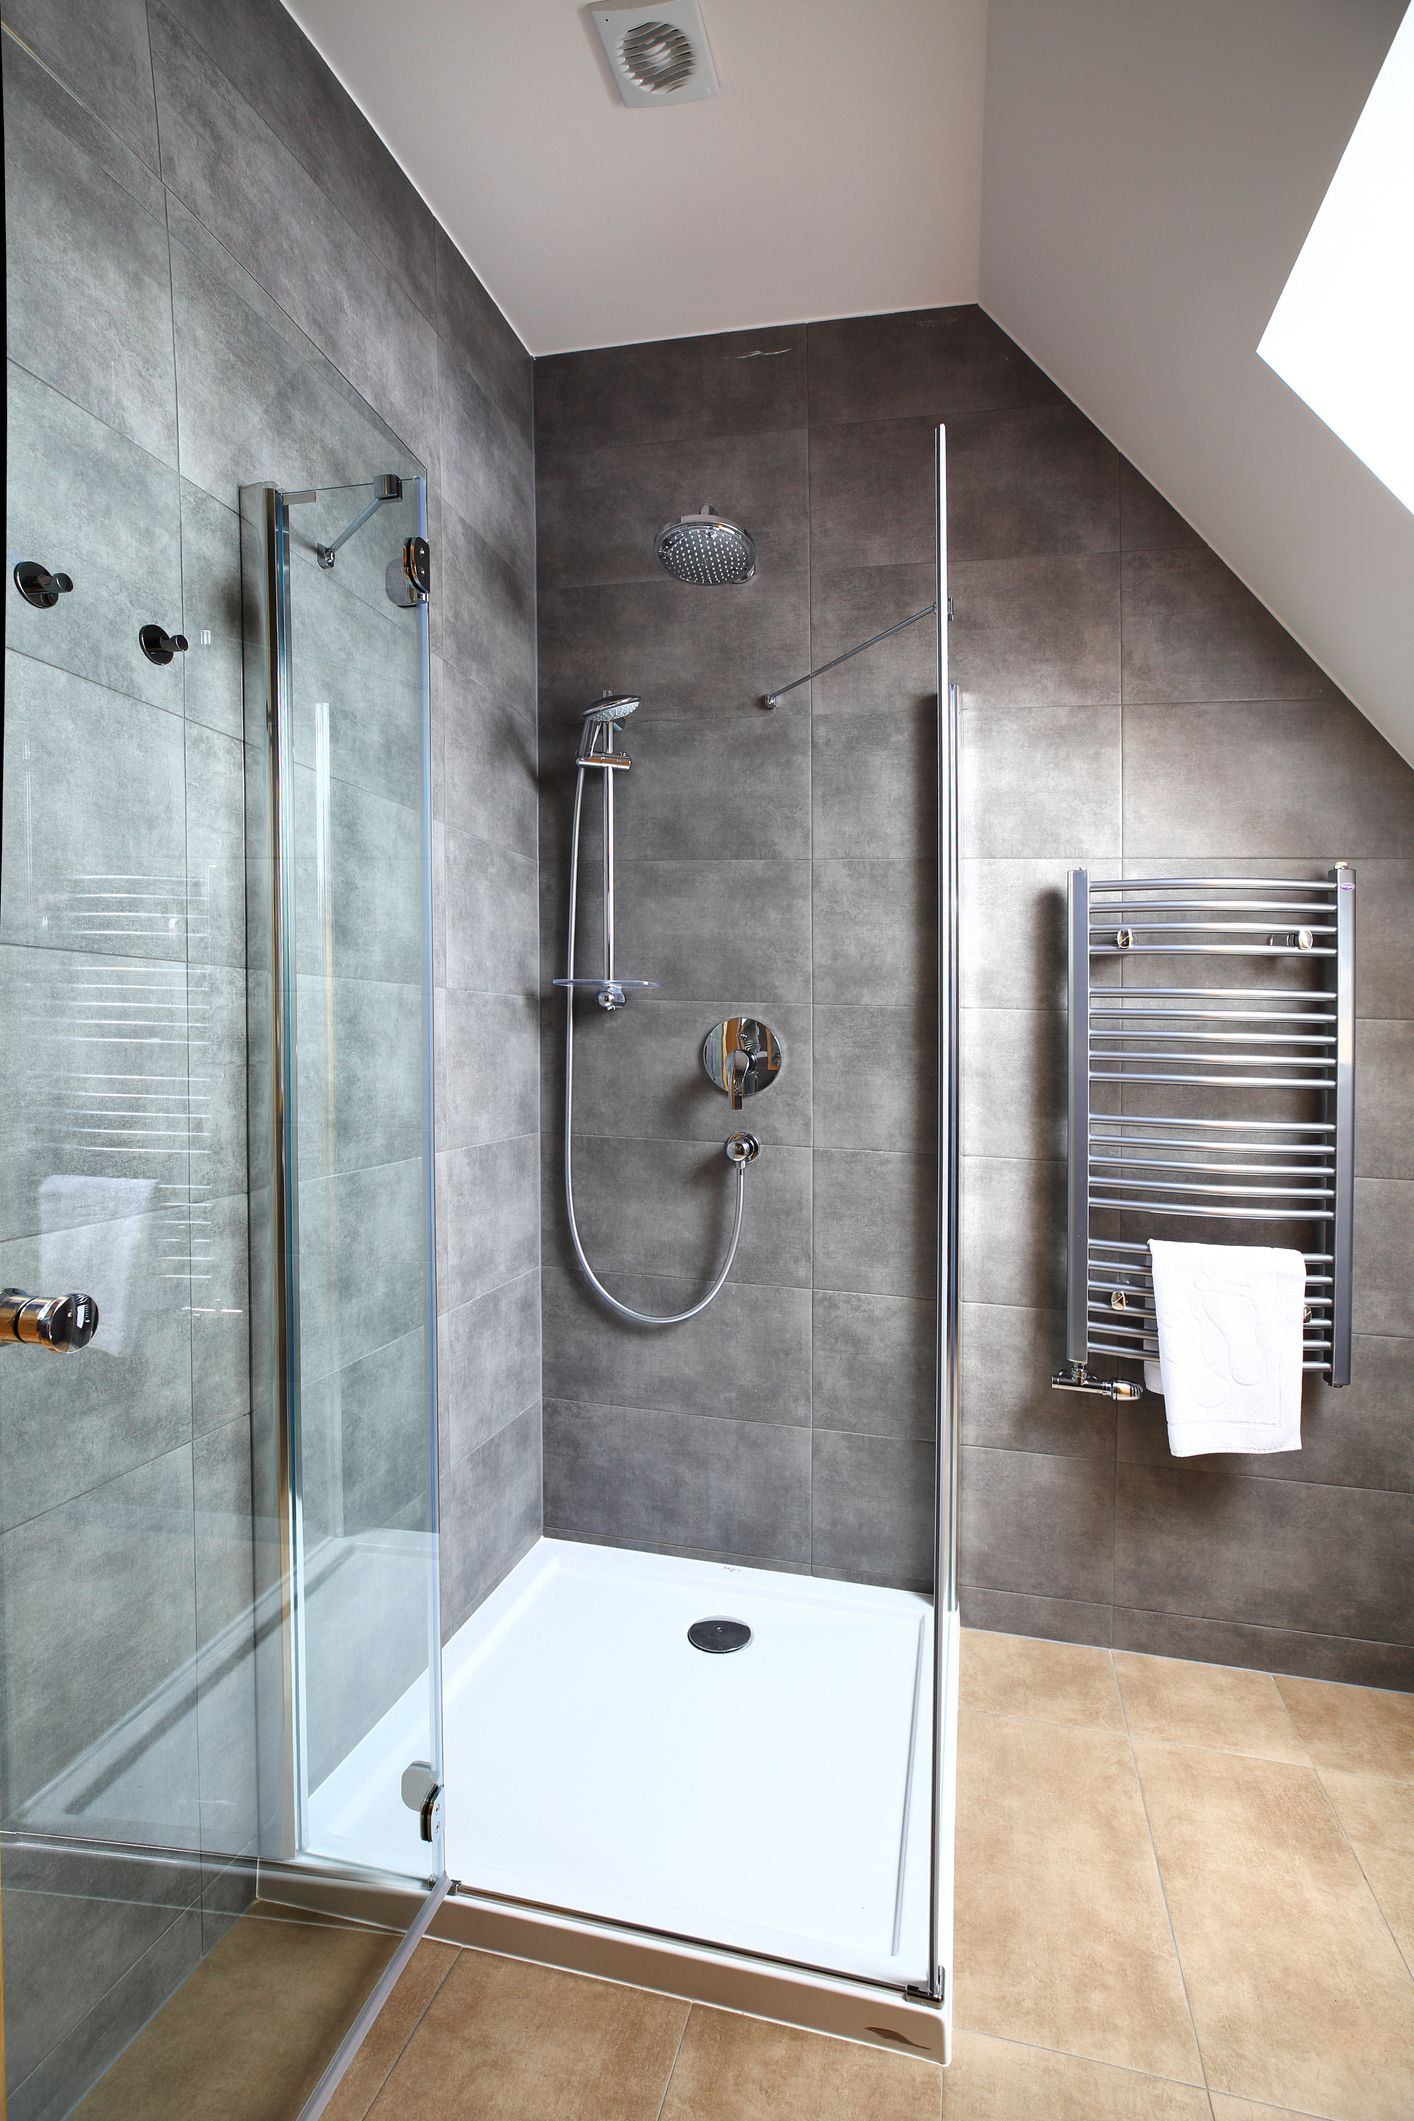 tiled shower stall with polyurethane pan